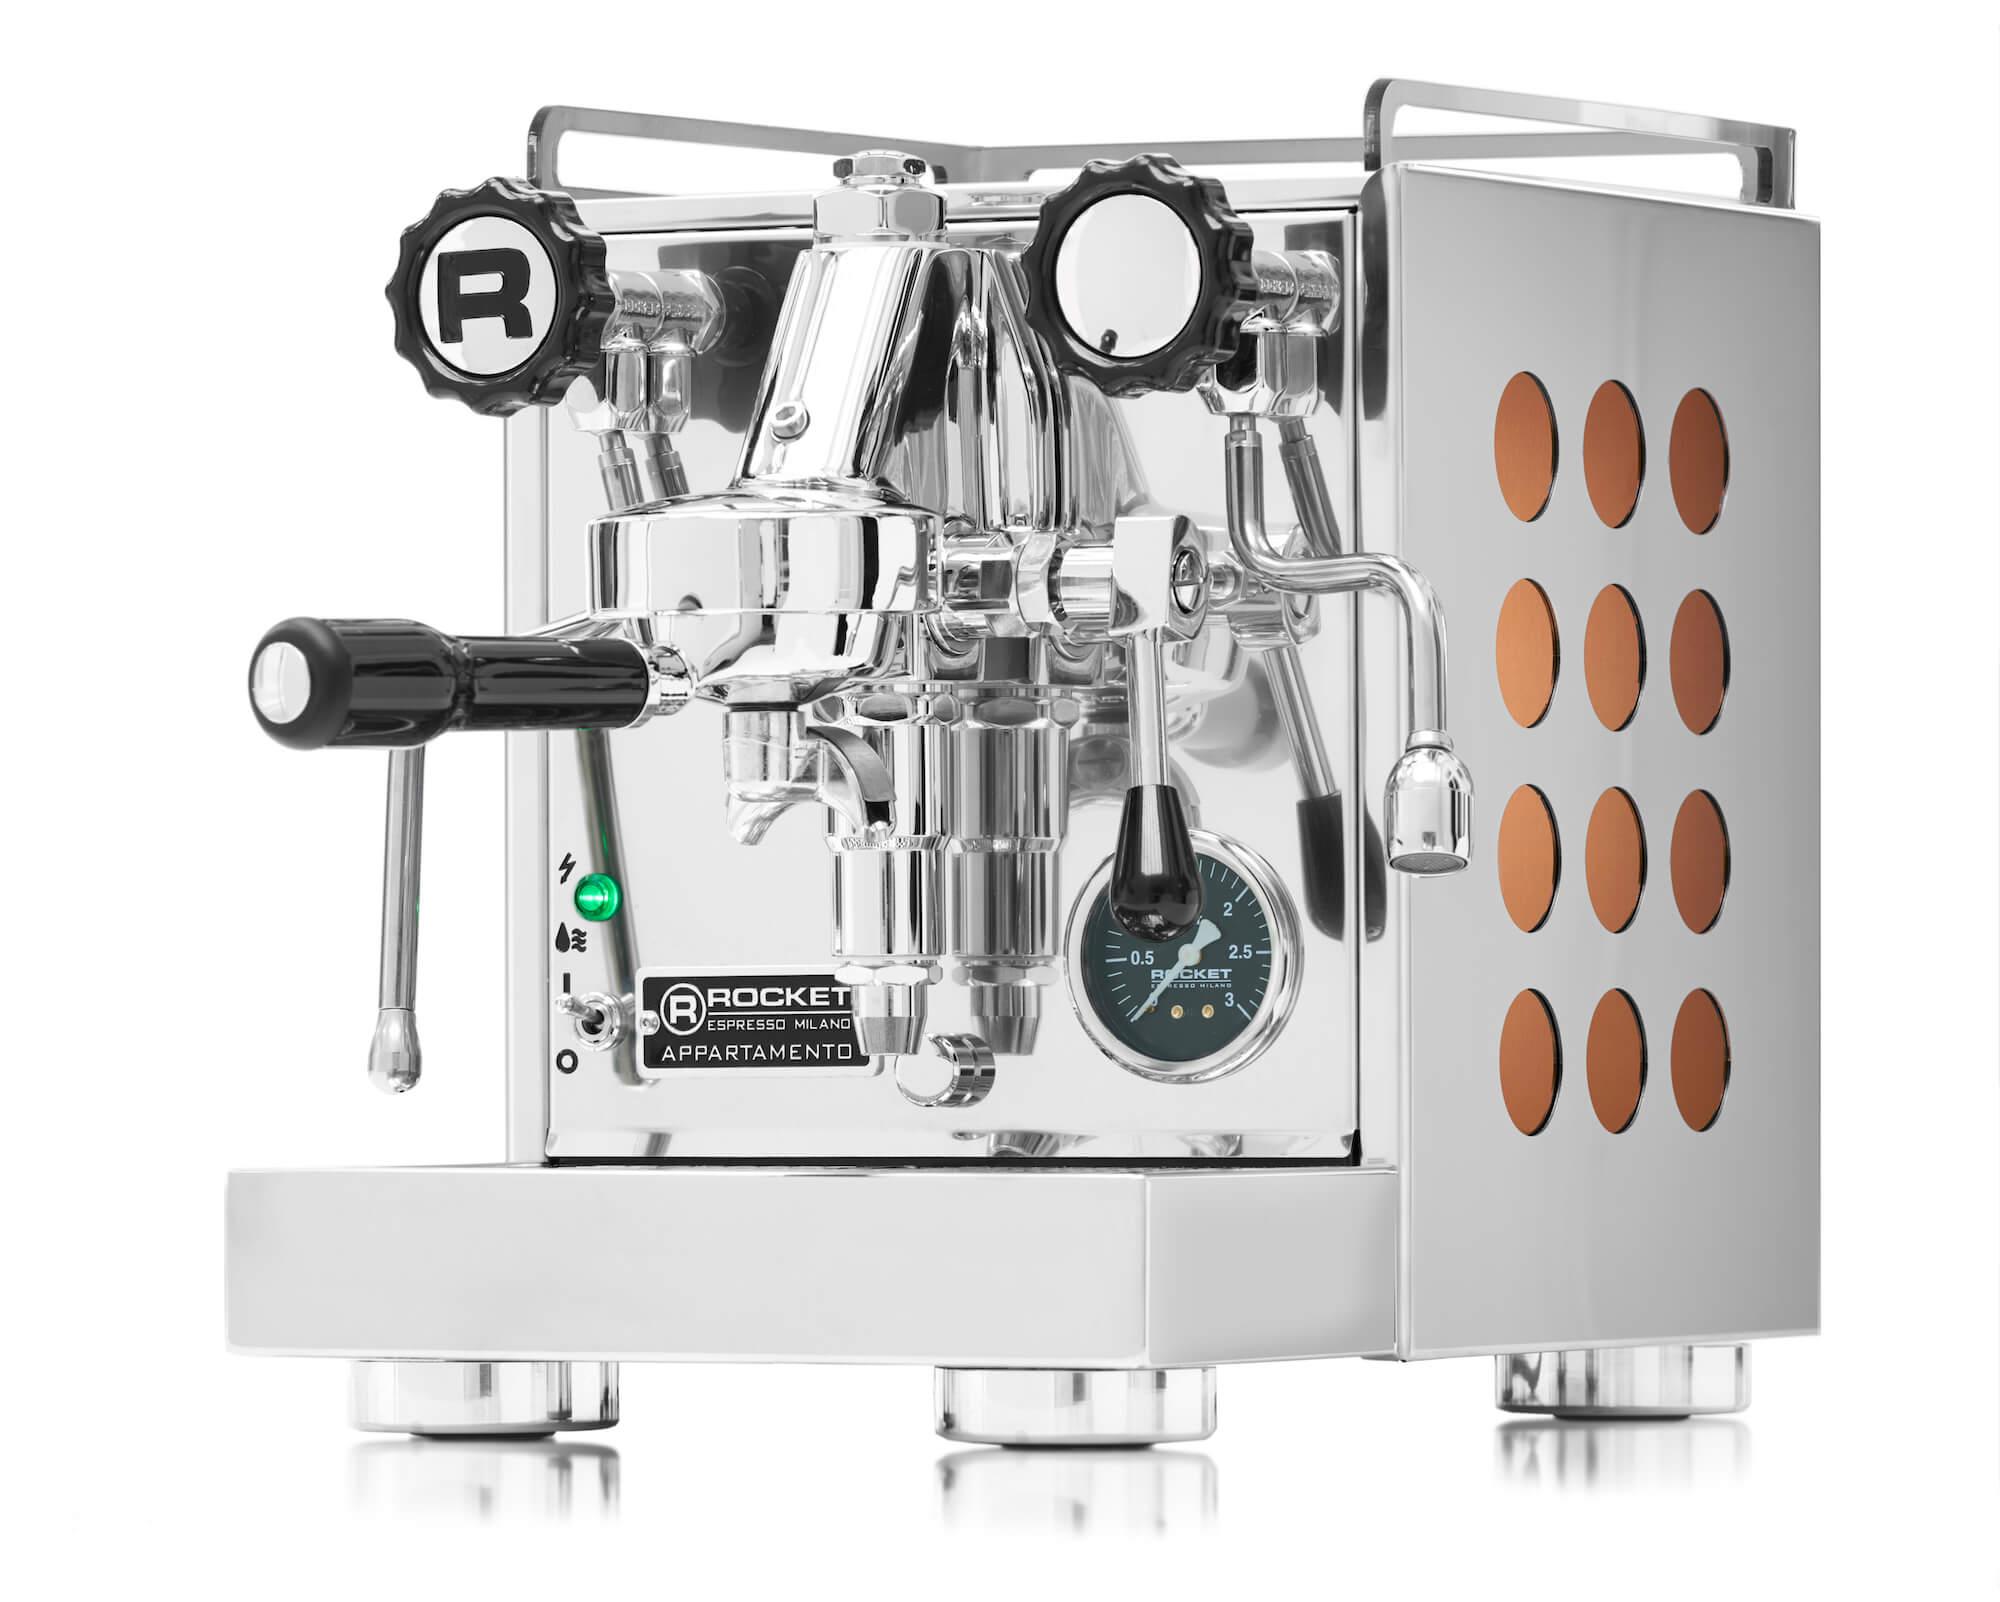 Rocket espressomachine Appartamento koper